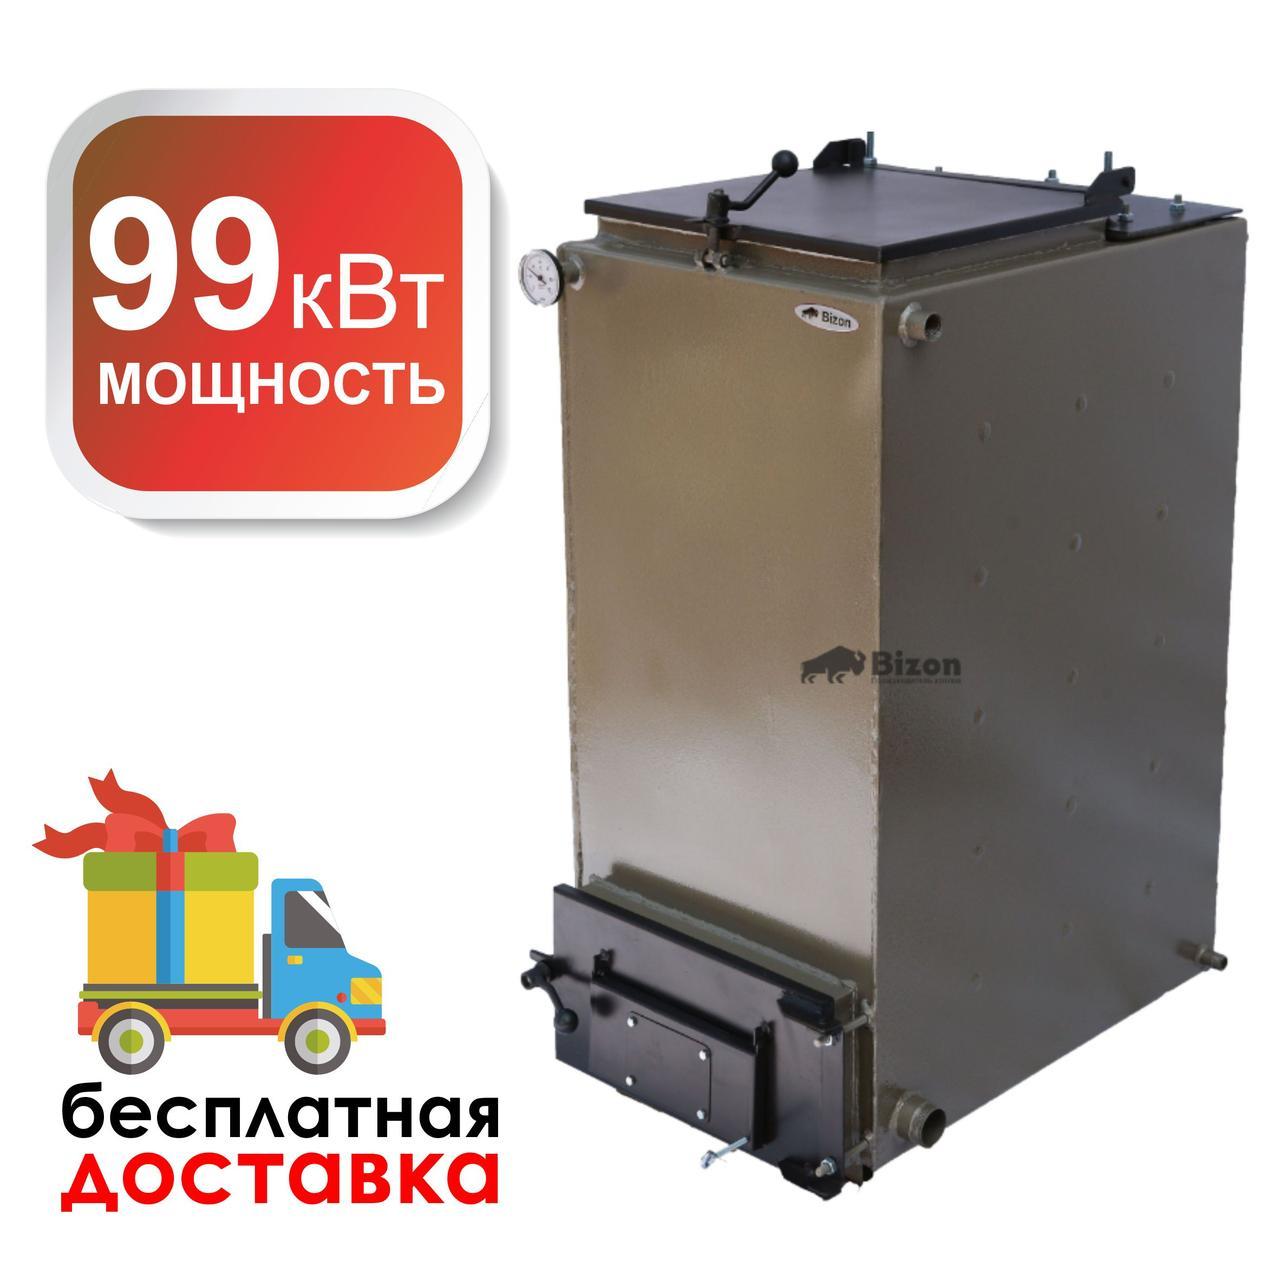 Котёл шахтный Холмова Bizon FS 99 кВт